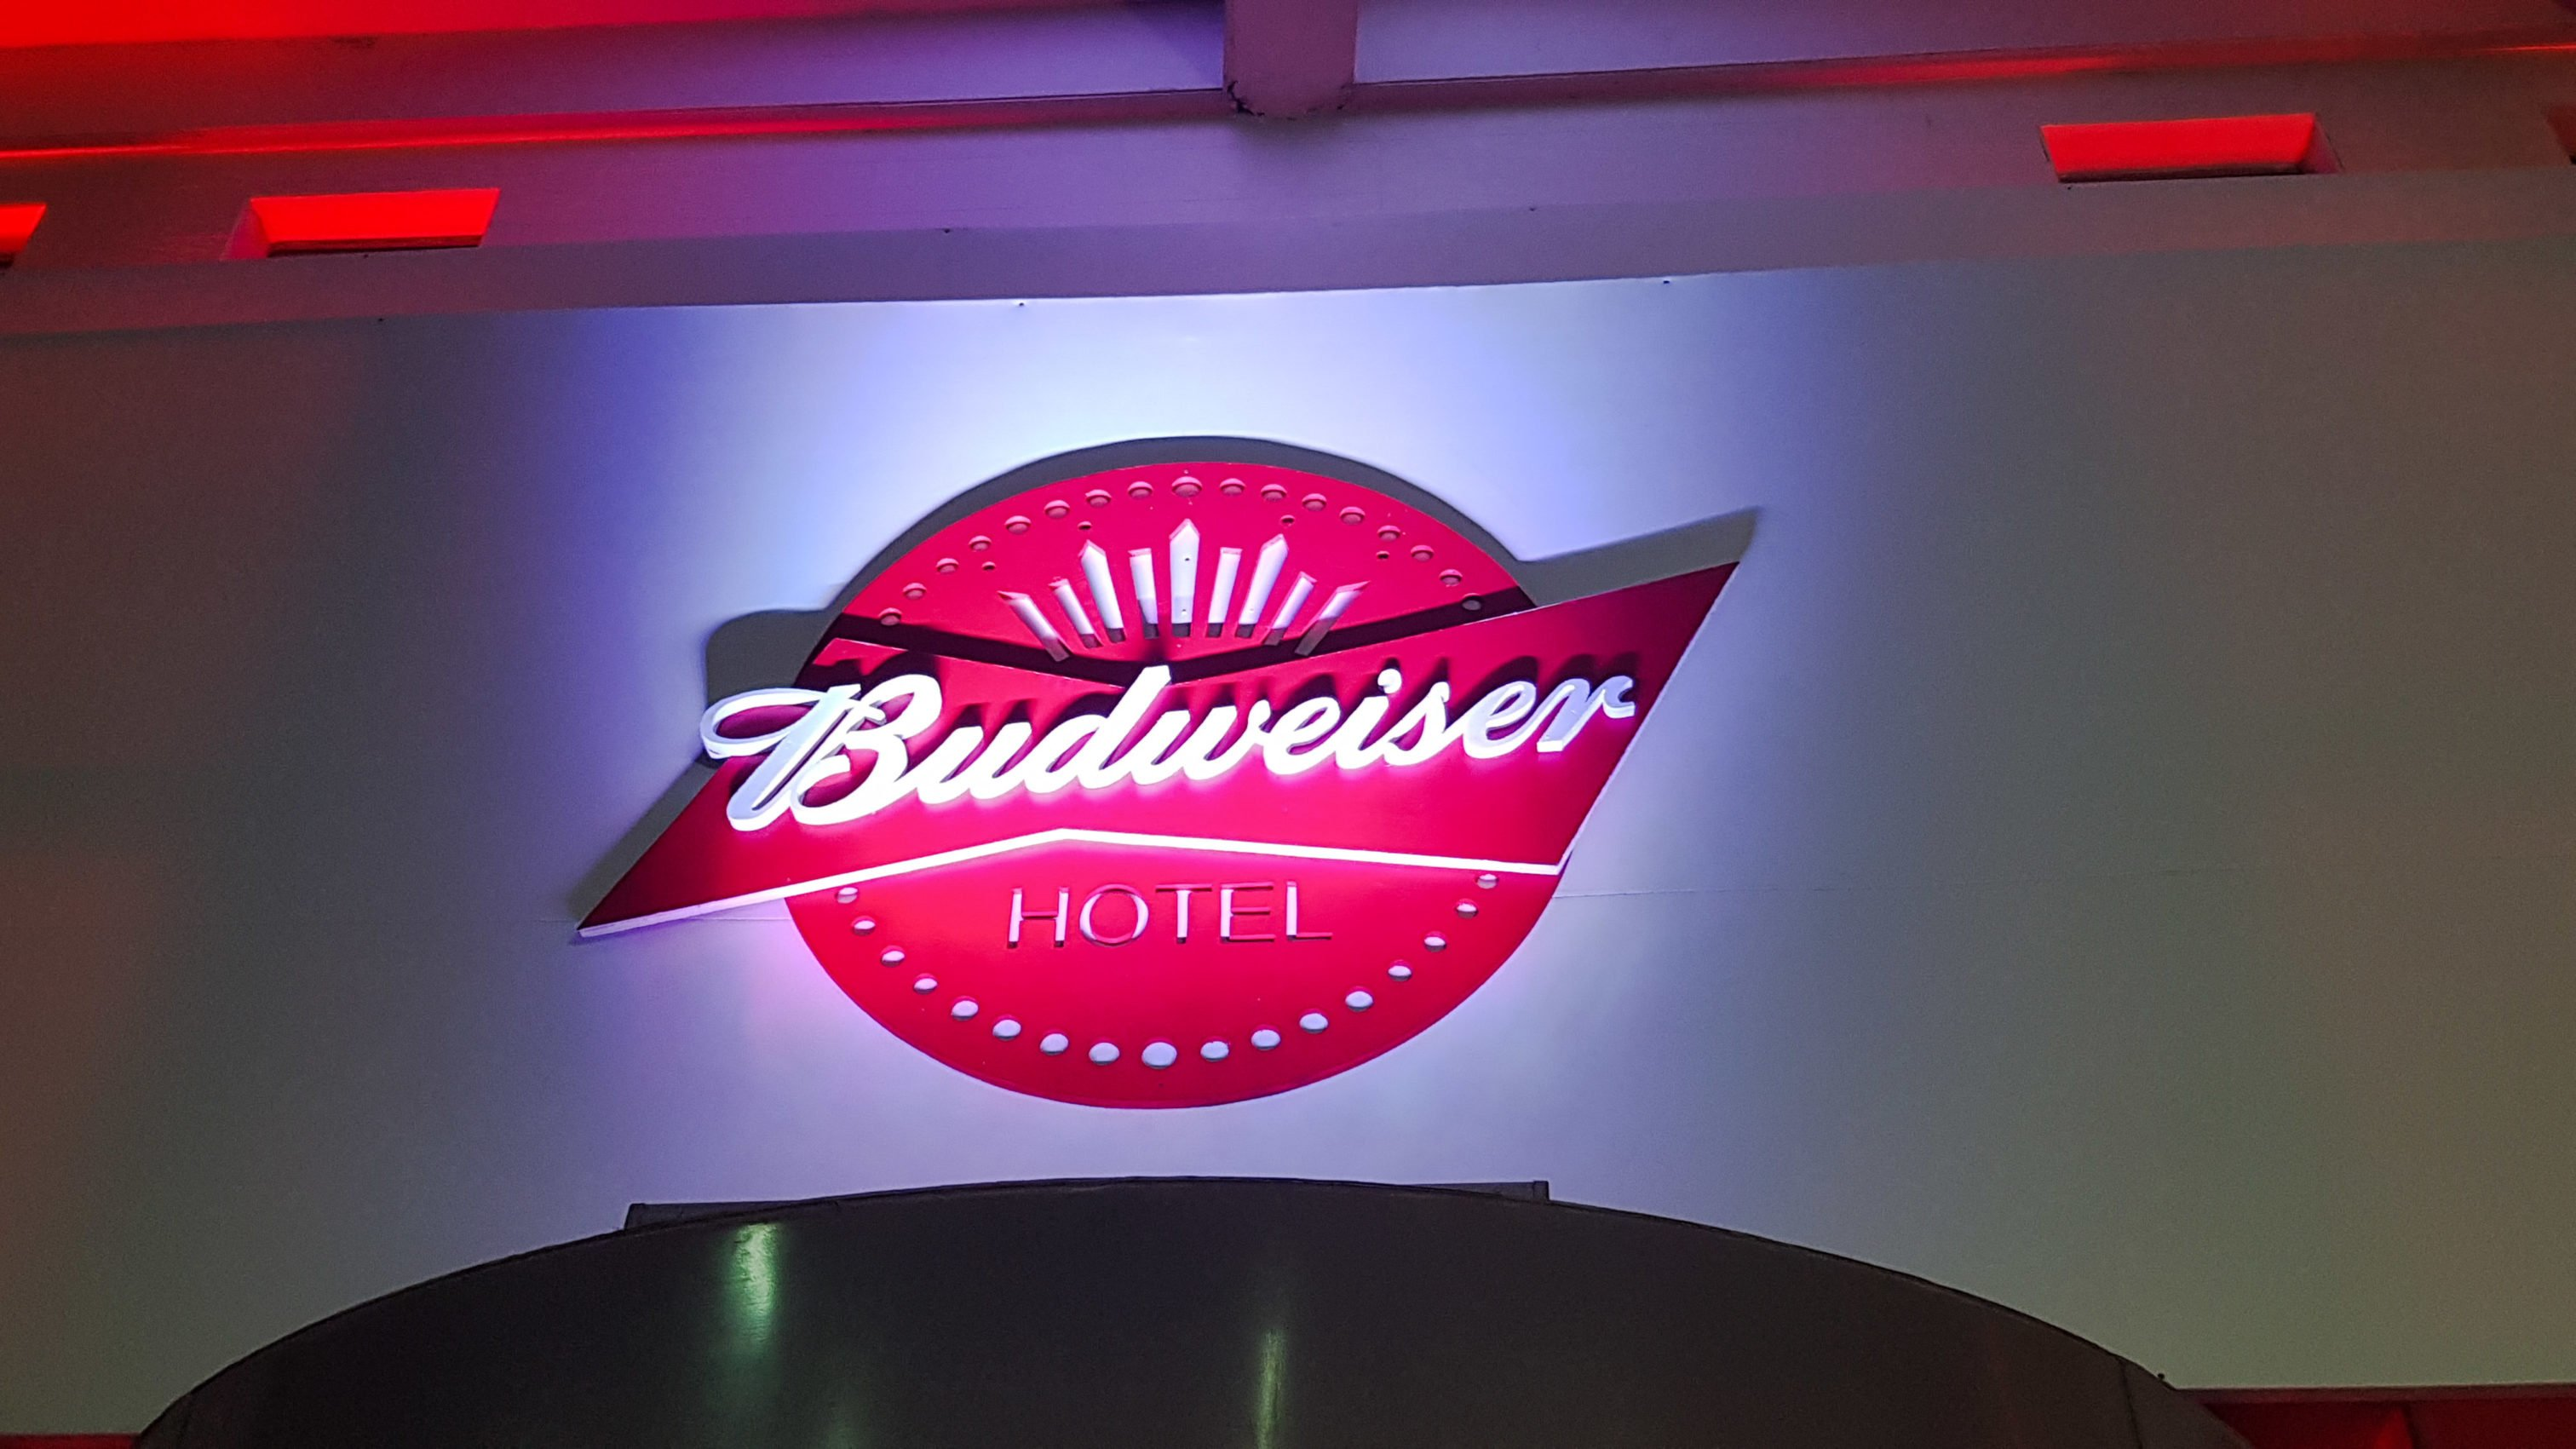 Budweiser Hotel